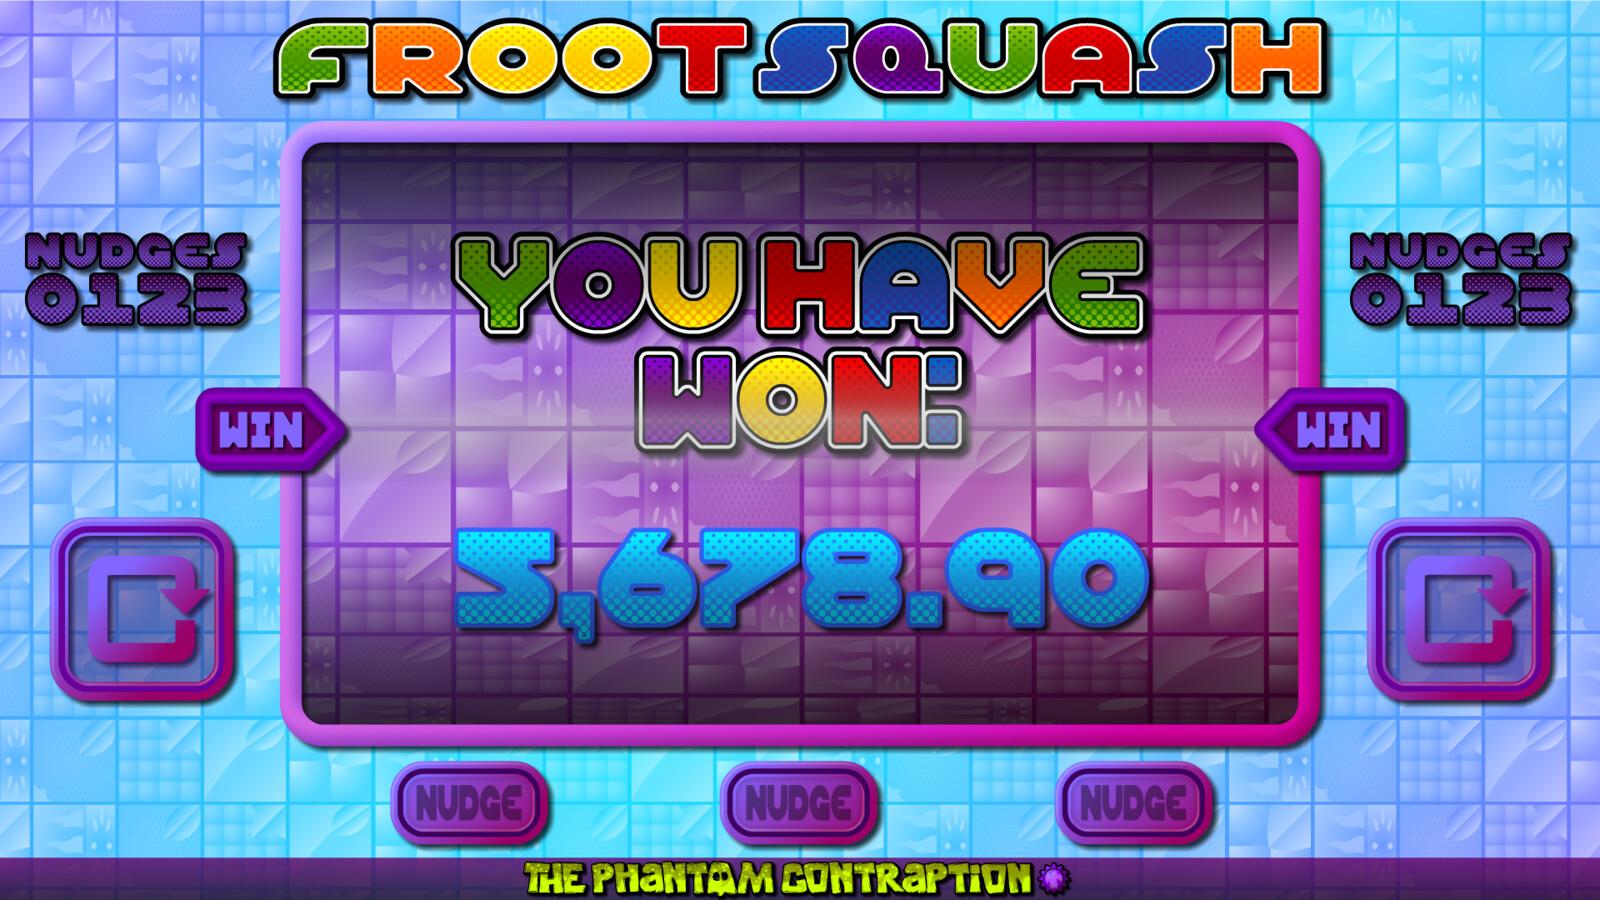 Froot Squash Landscape Screenshot: You Have Won